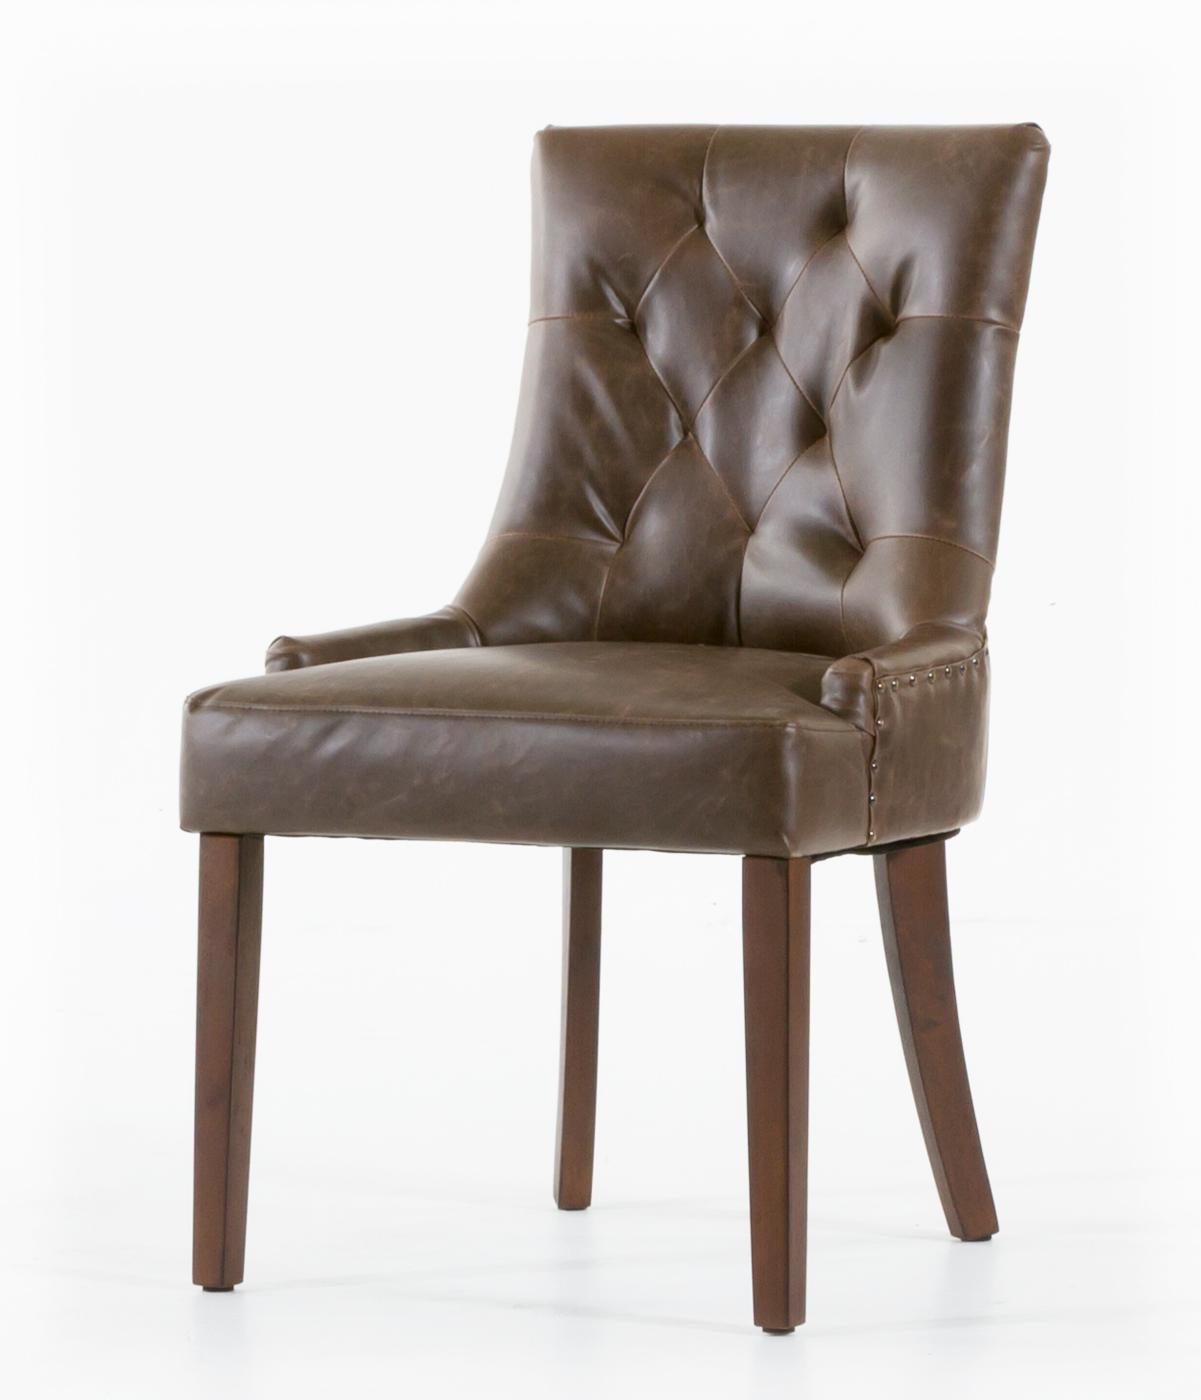 Tuva stol Vintage Läder 995 kr Trendrum se